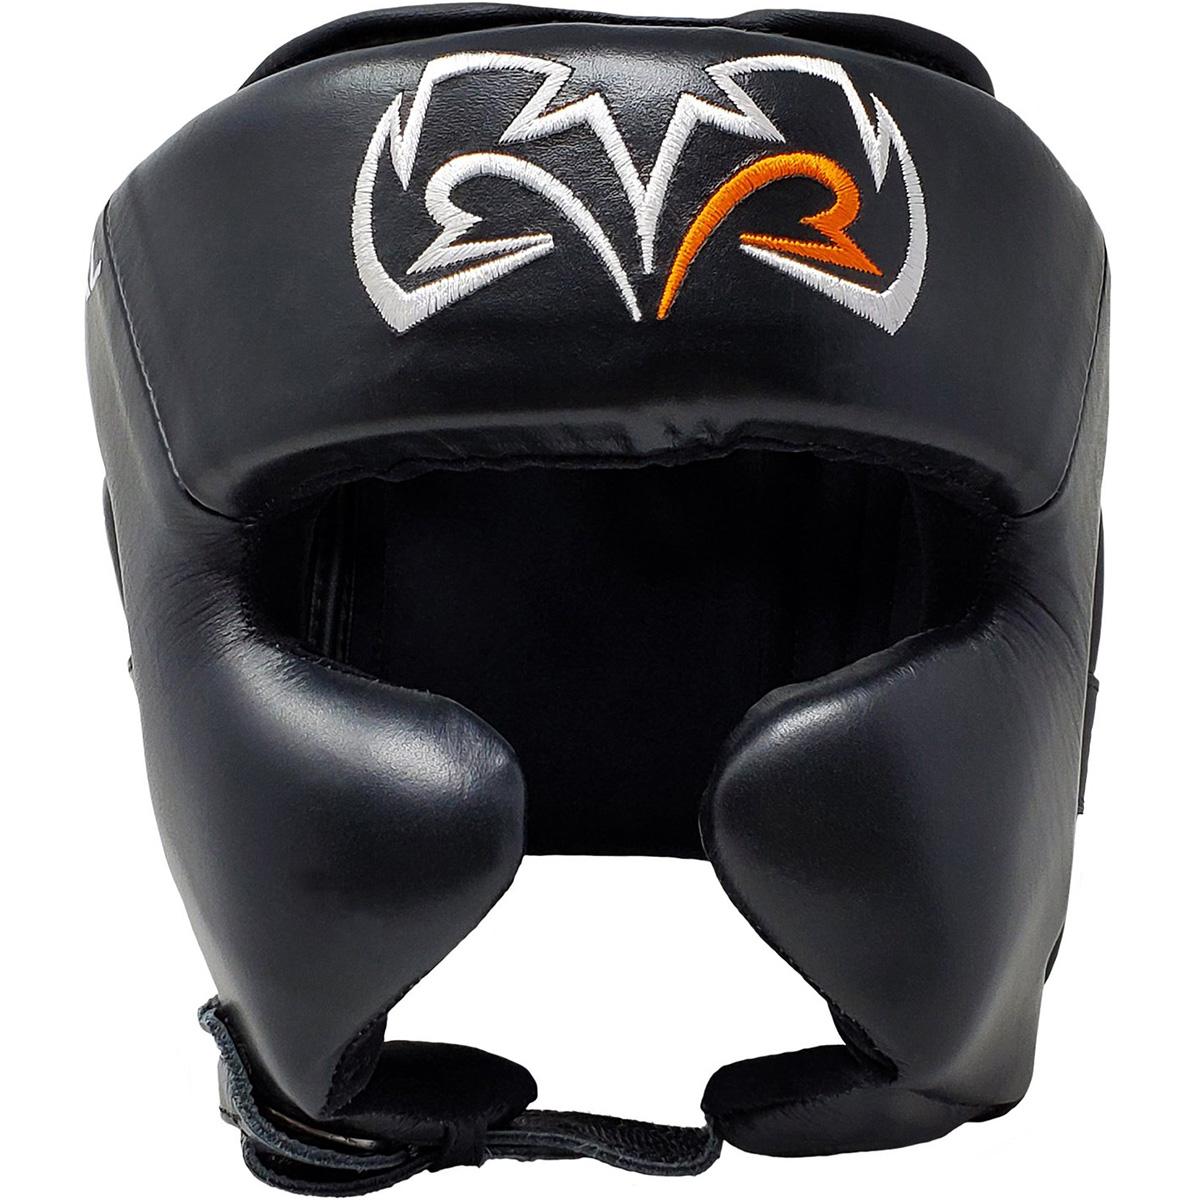 thumbnail 5 - RIVAL Boxing RHG2 Training Headgear